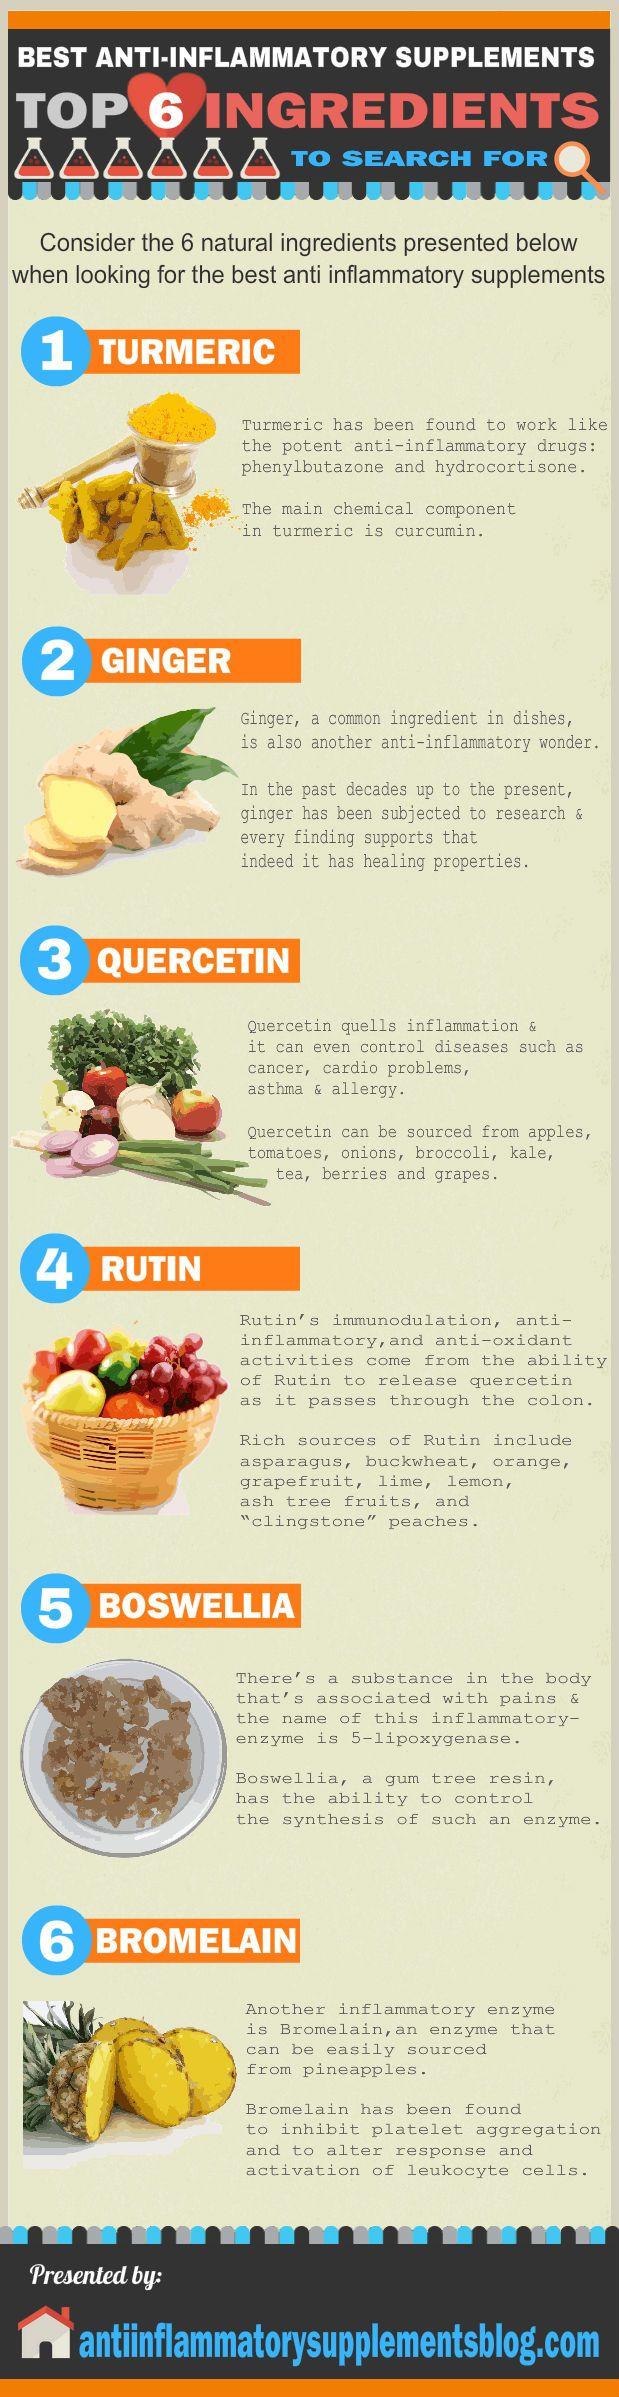 Best Anti-inflammatory Ingredients: Top 6 anti-inflammatory Ingredients